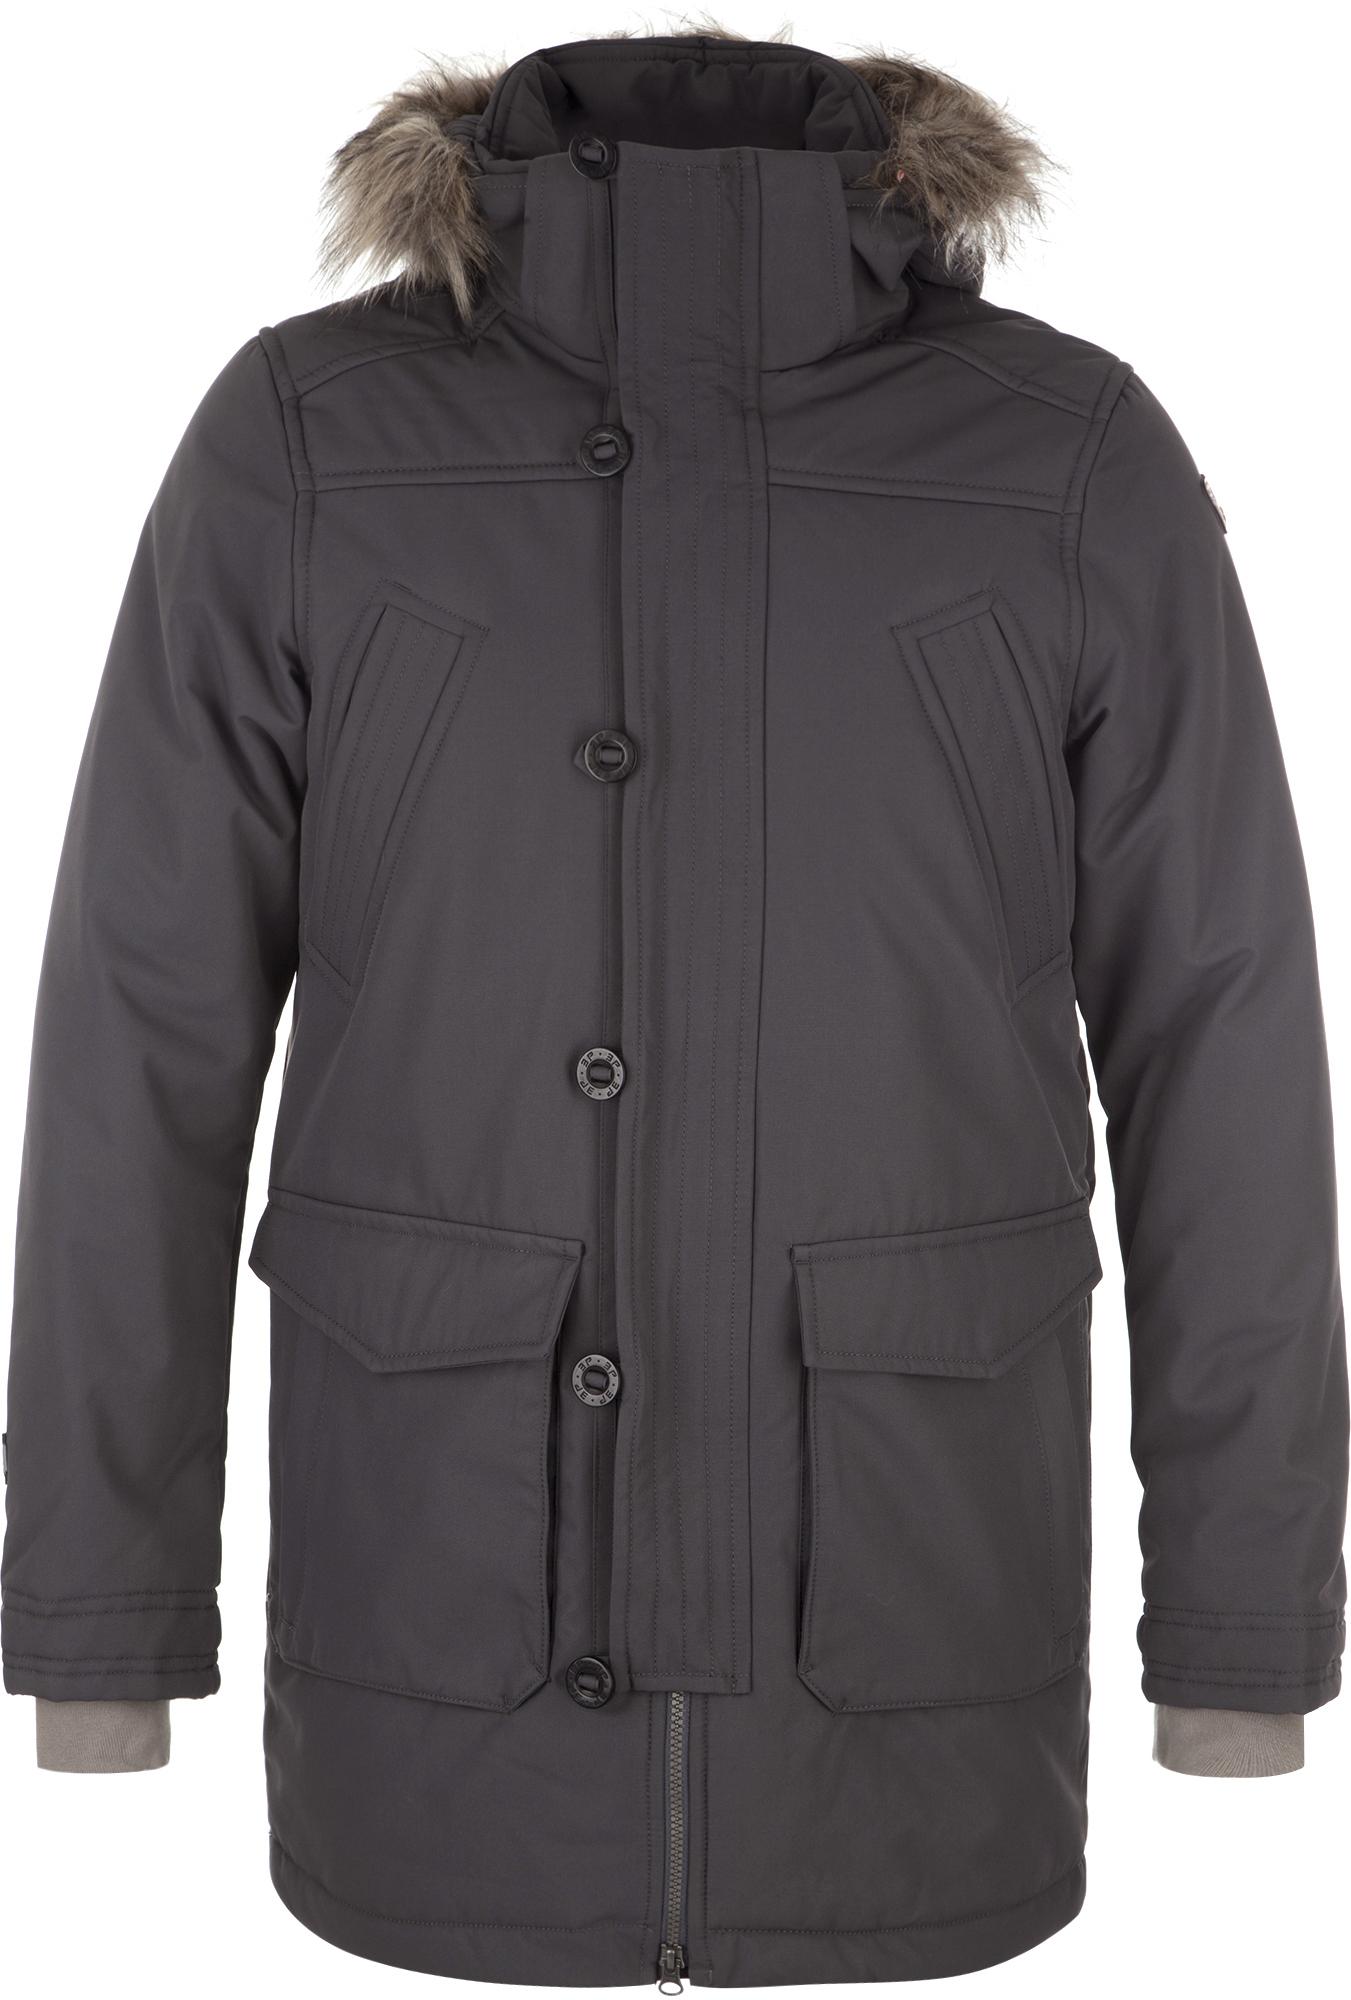 IcePeak Куртка утепленная мужская IcePeak Tapio куртка утепленная icepeak icepeak ic647ewmwf66